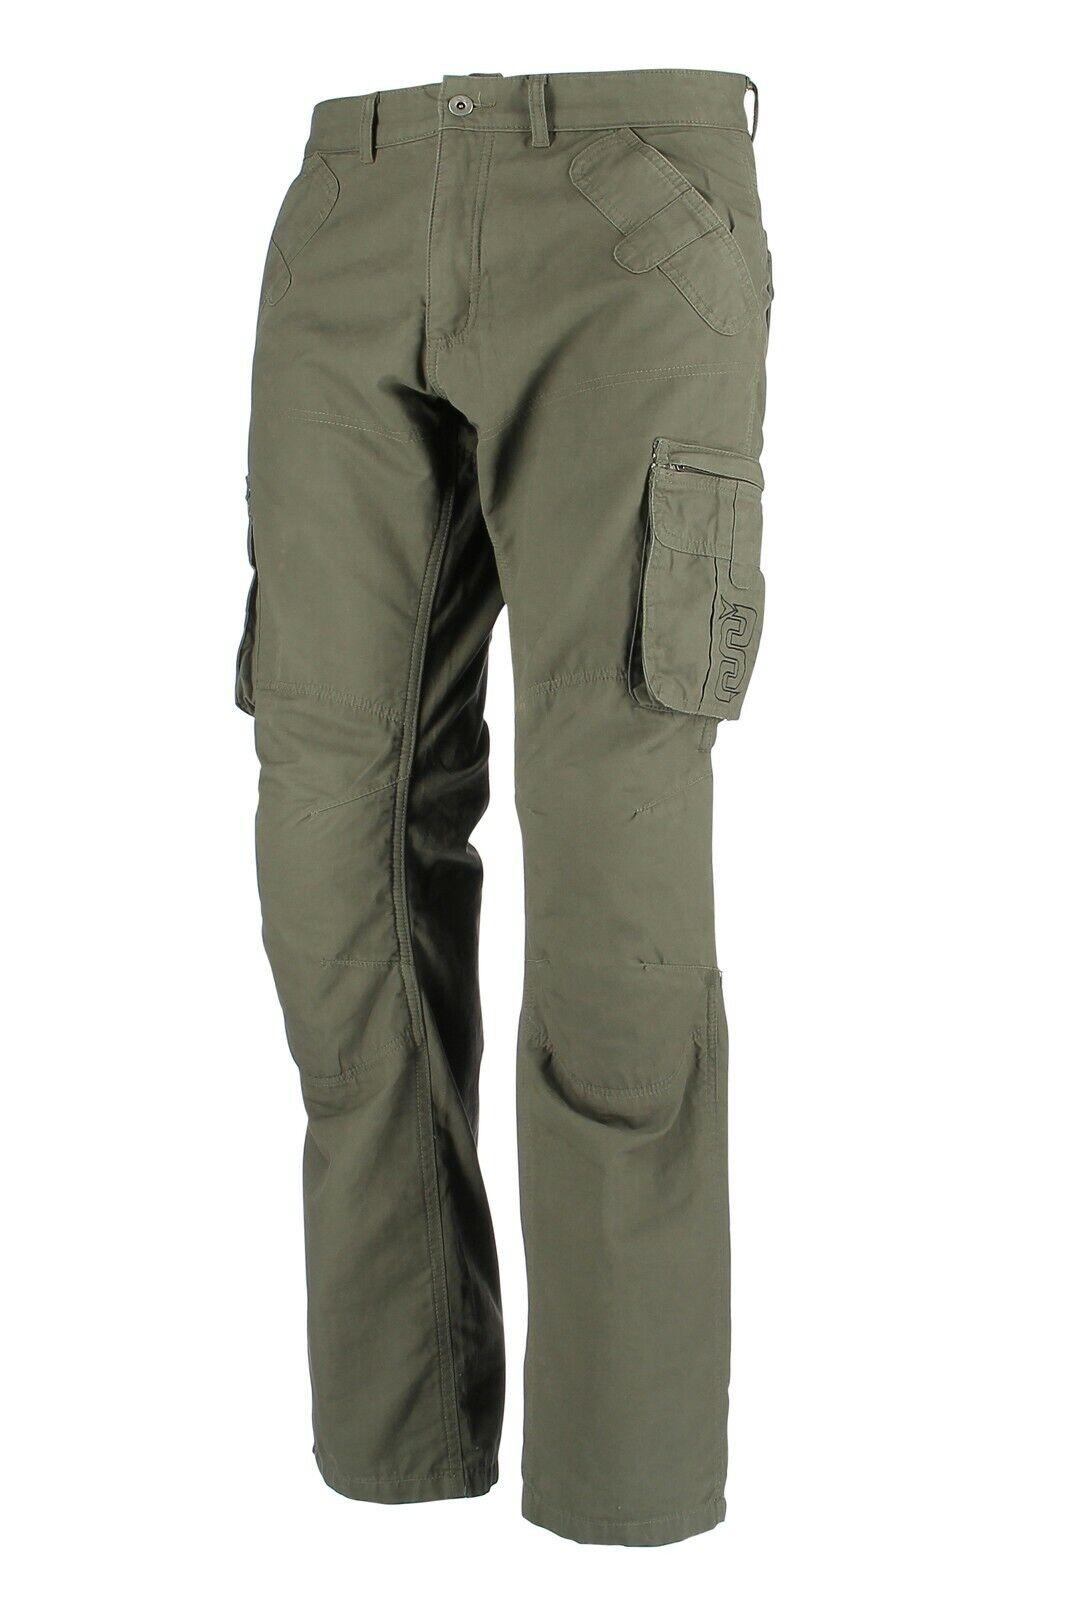 Pantaloni tecnici moto OJ Cargo verde militare taglia 48